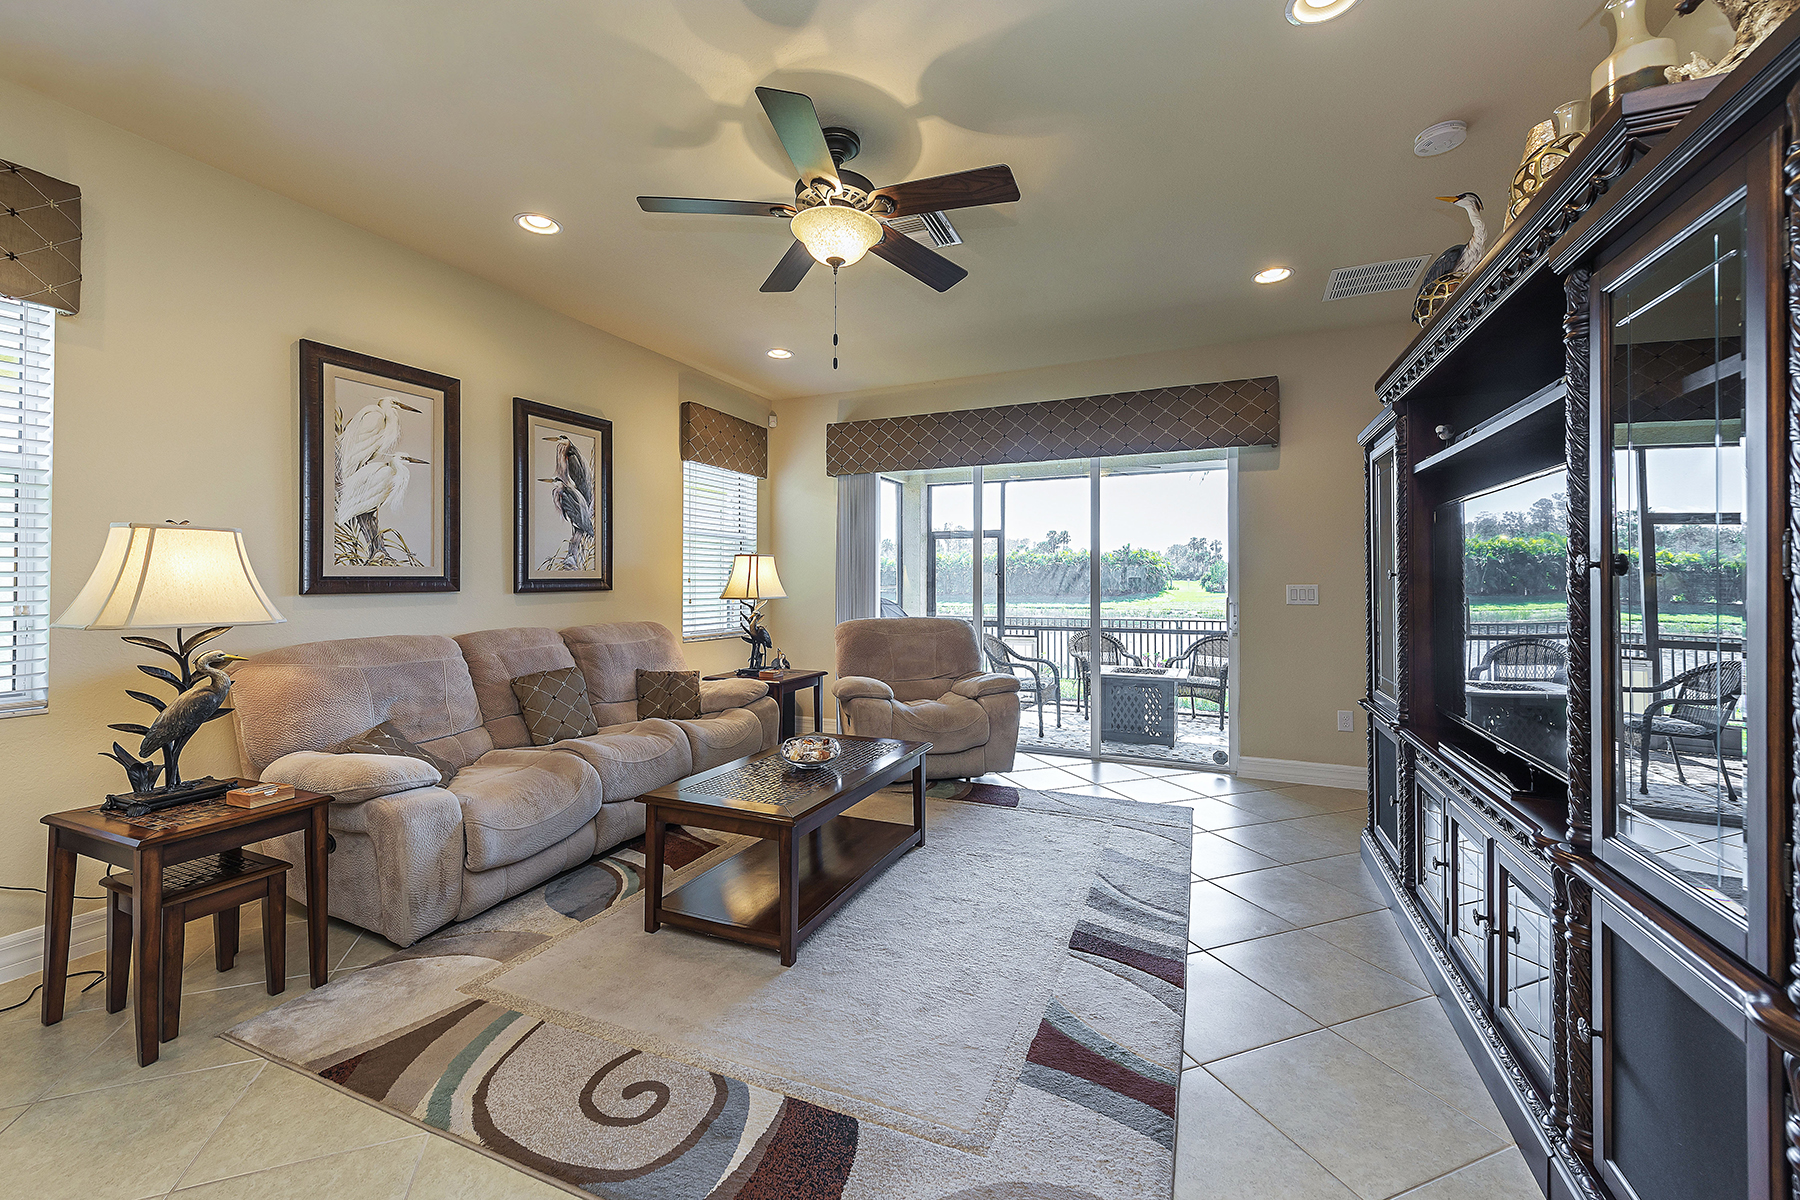 Single Family Home for Sale at BONITA LAKES-BONITA LAKES 10478 Spruce Pine Ct, Fort Myers, Florida 33913 United States